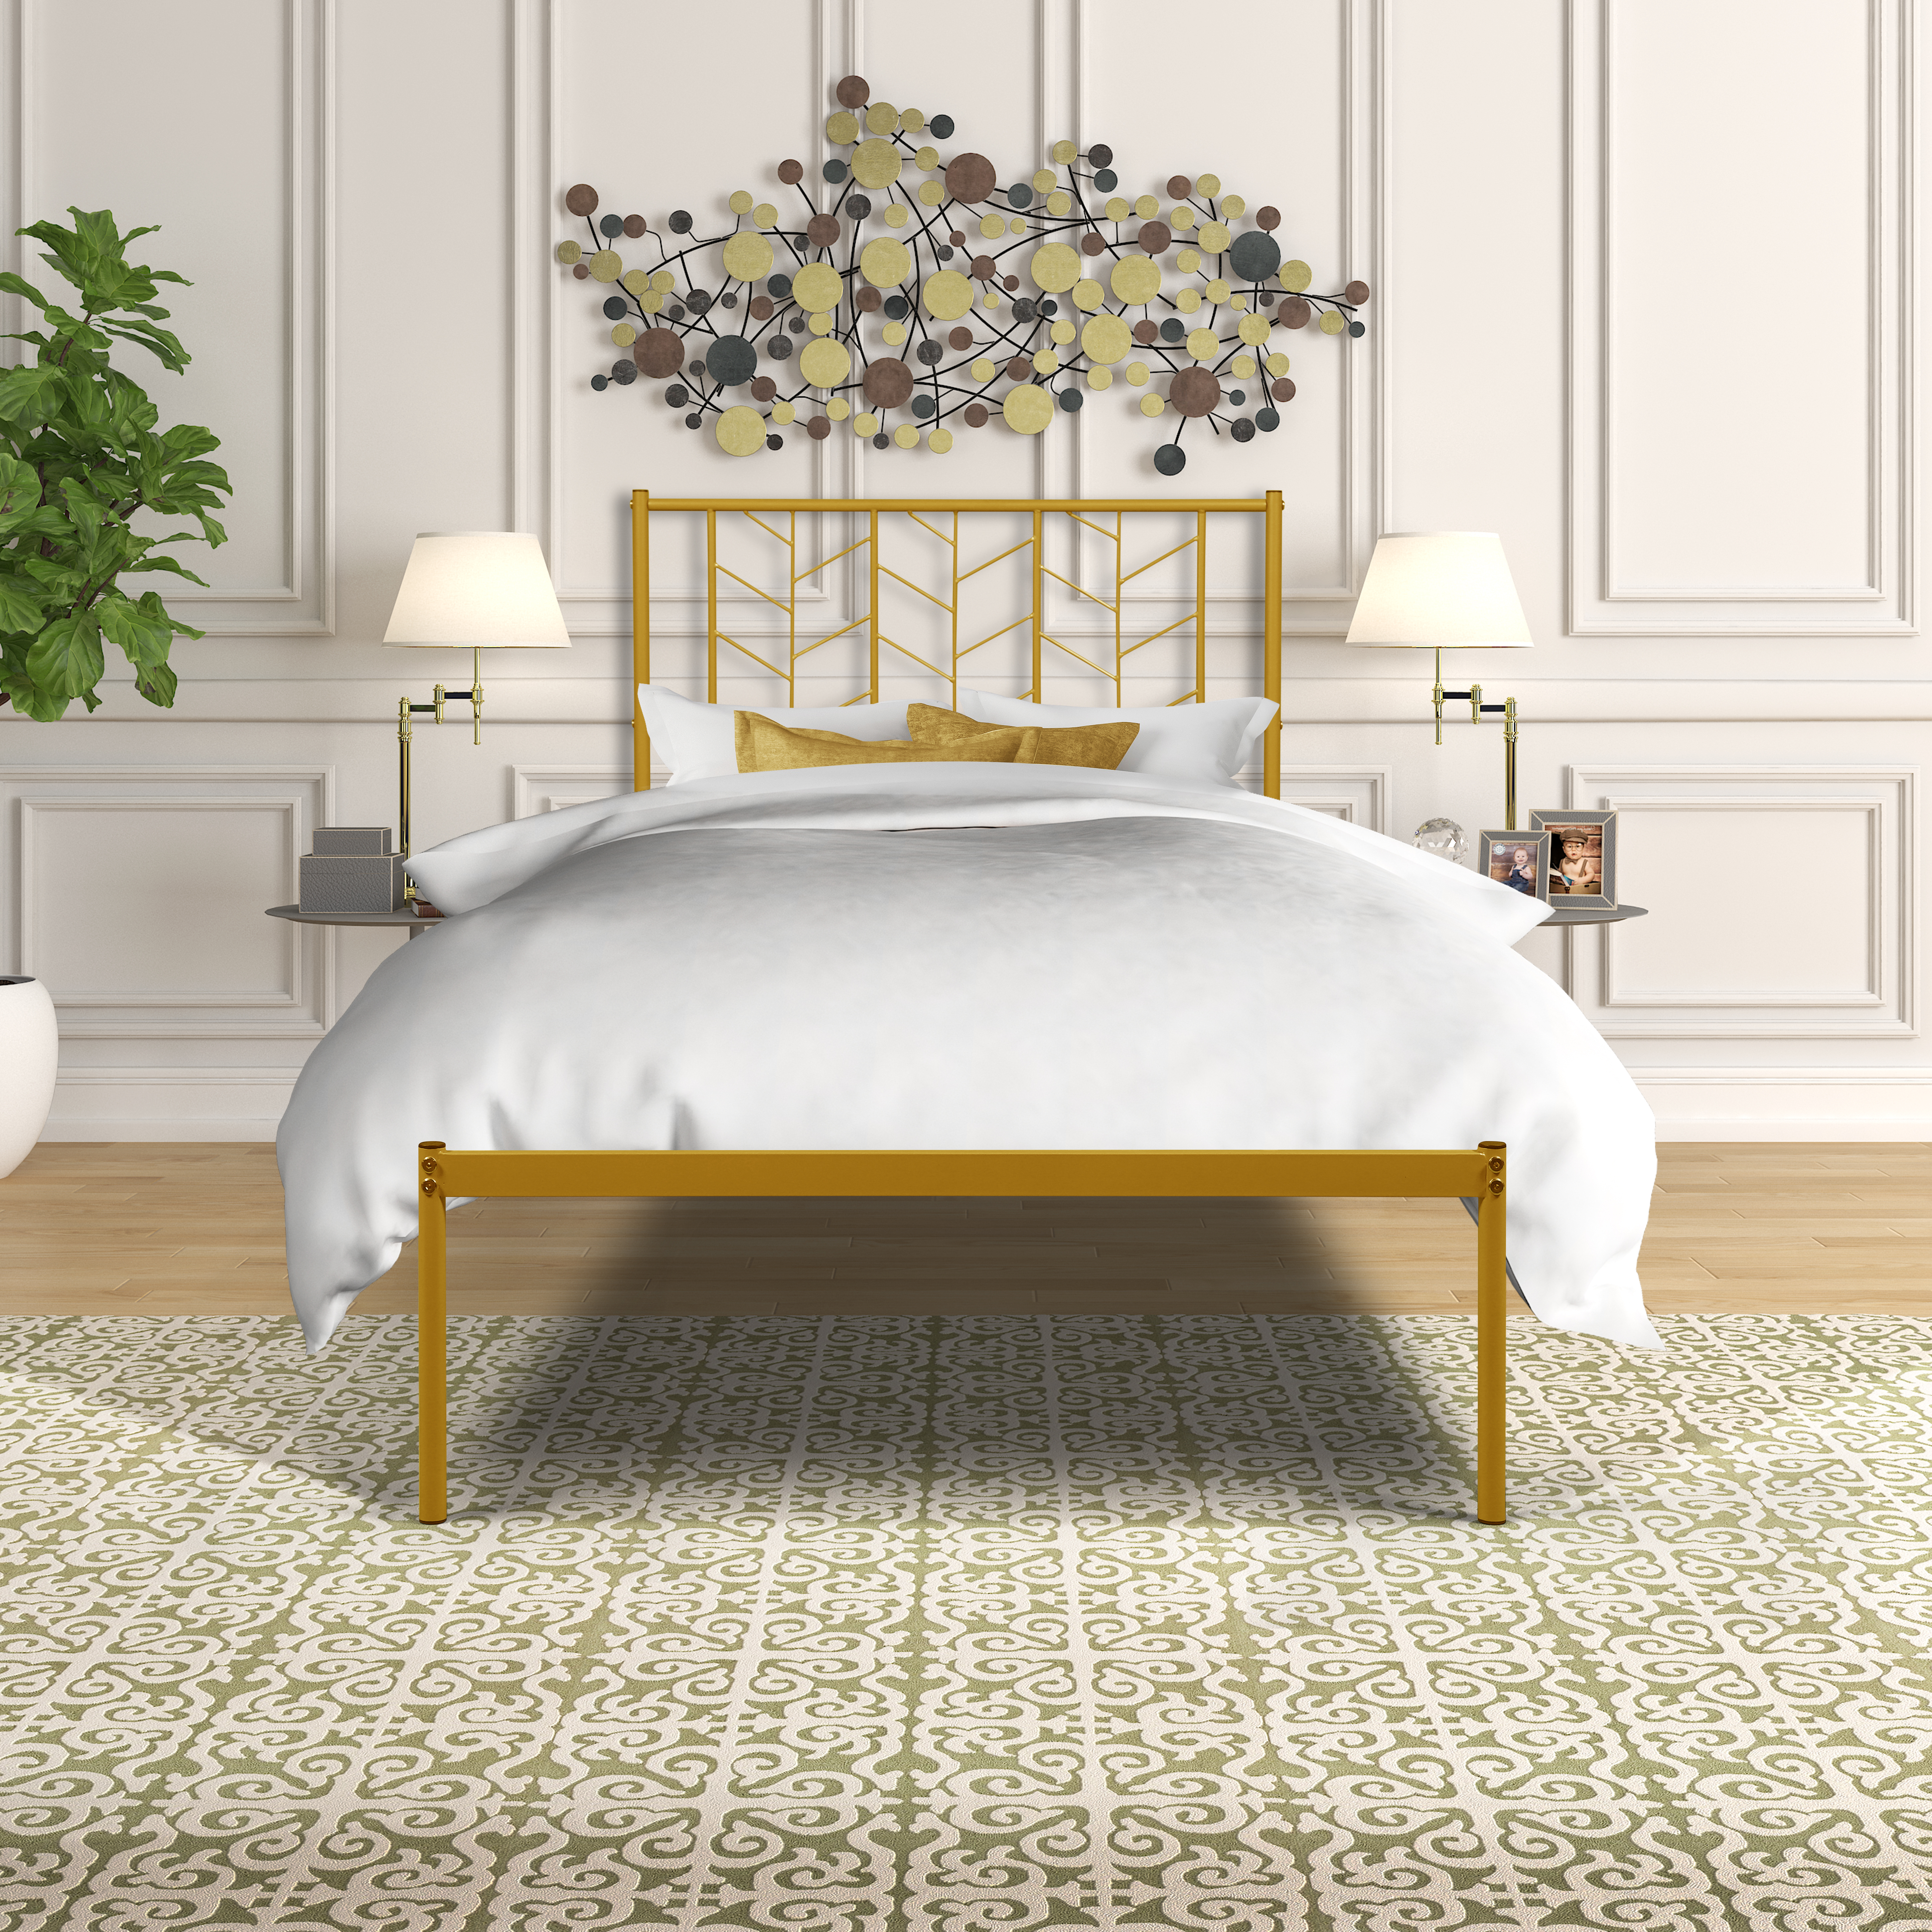 [US Direct] Vintage Look Twin Metal Bed Frame